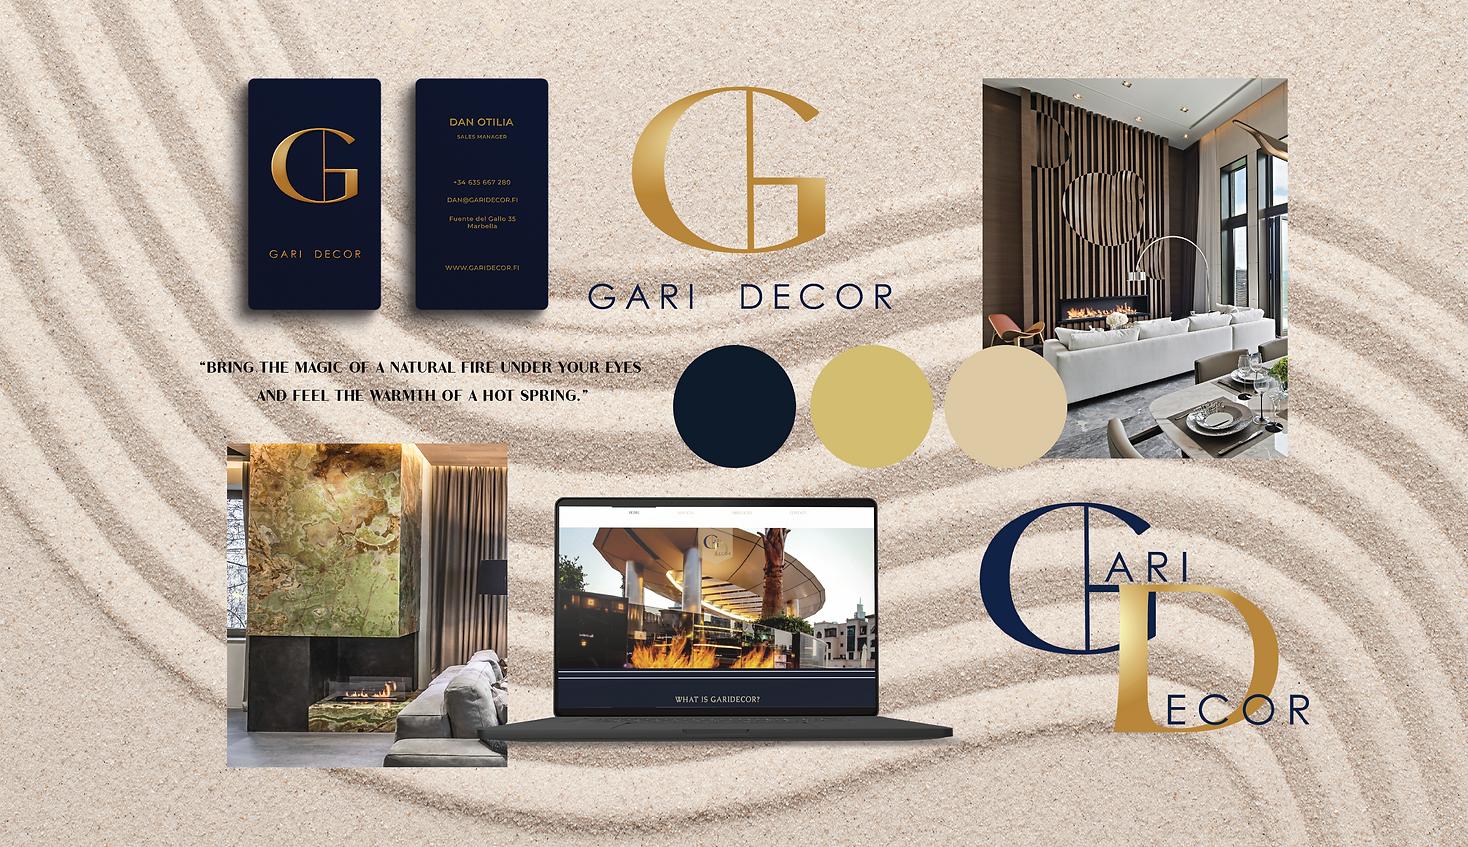 Gari Decor branding